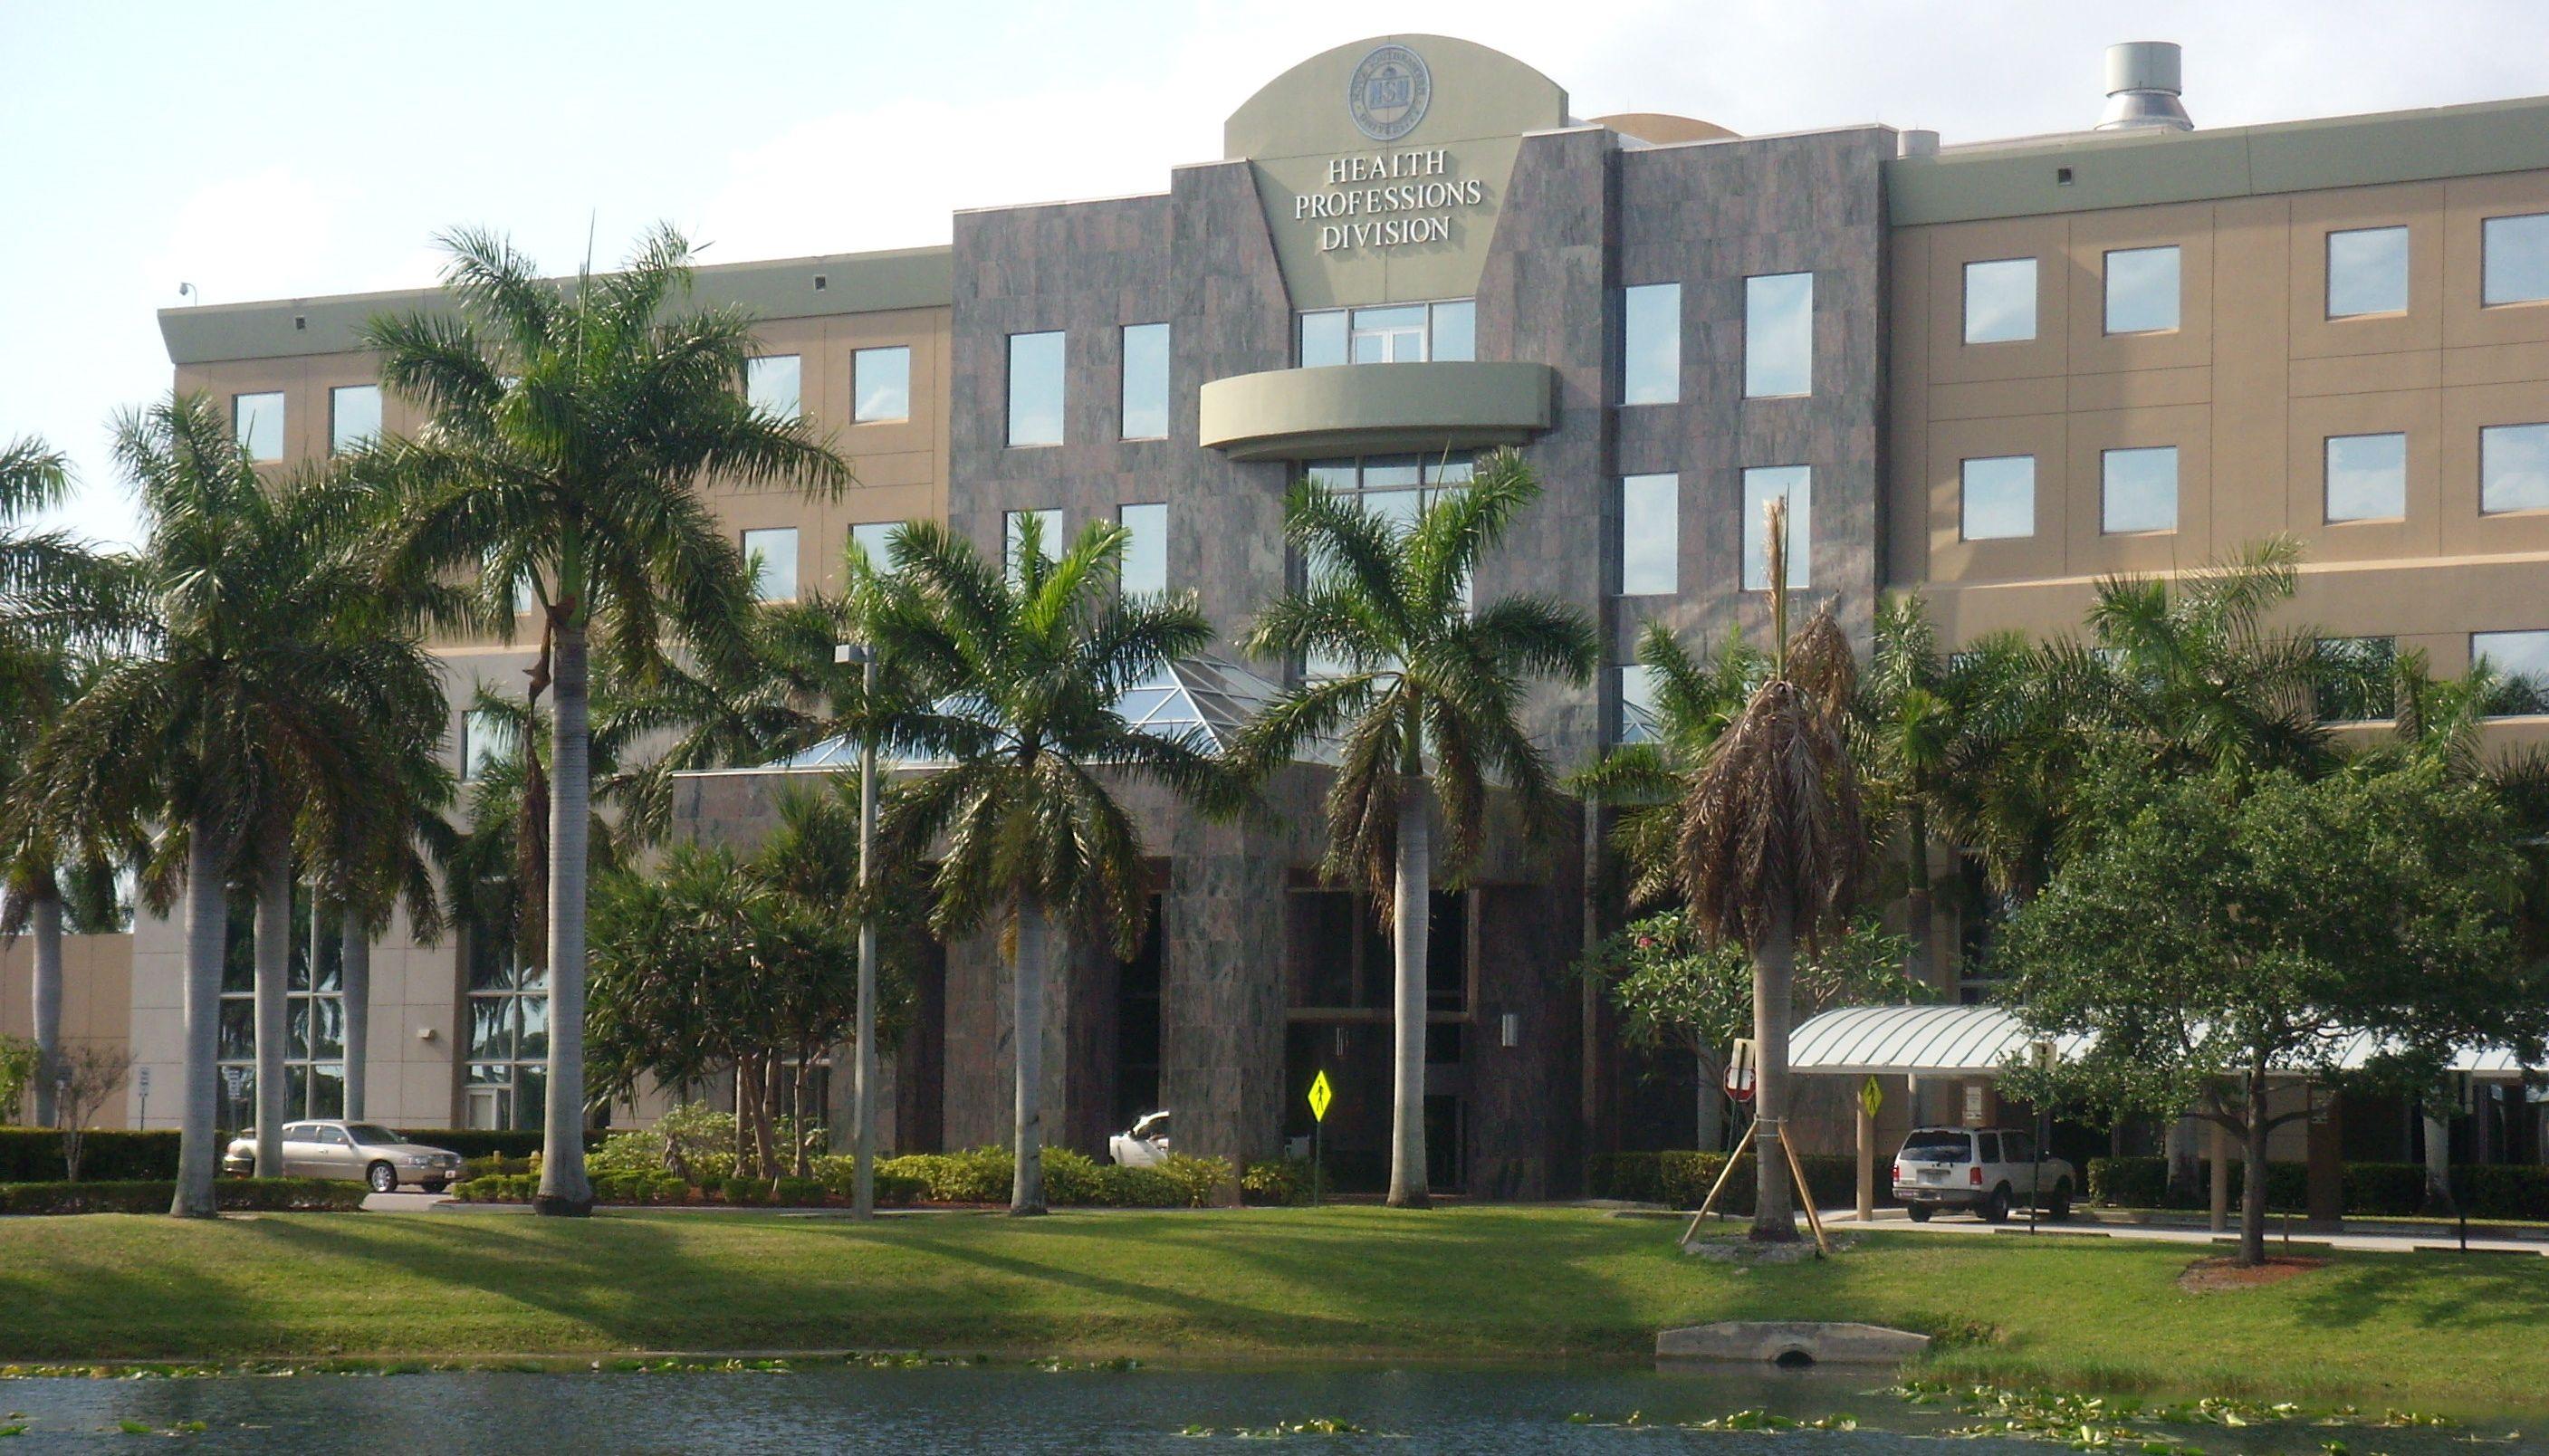 Nova south eastern university early childhood center